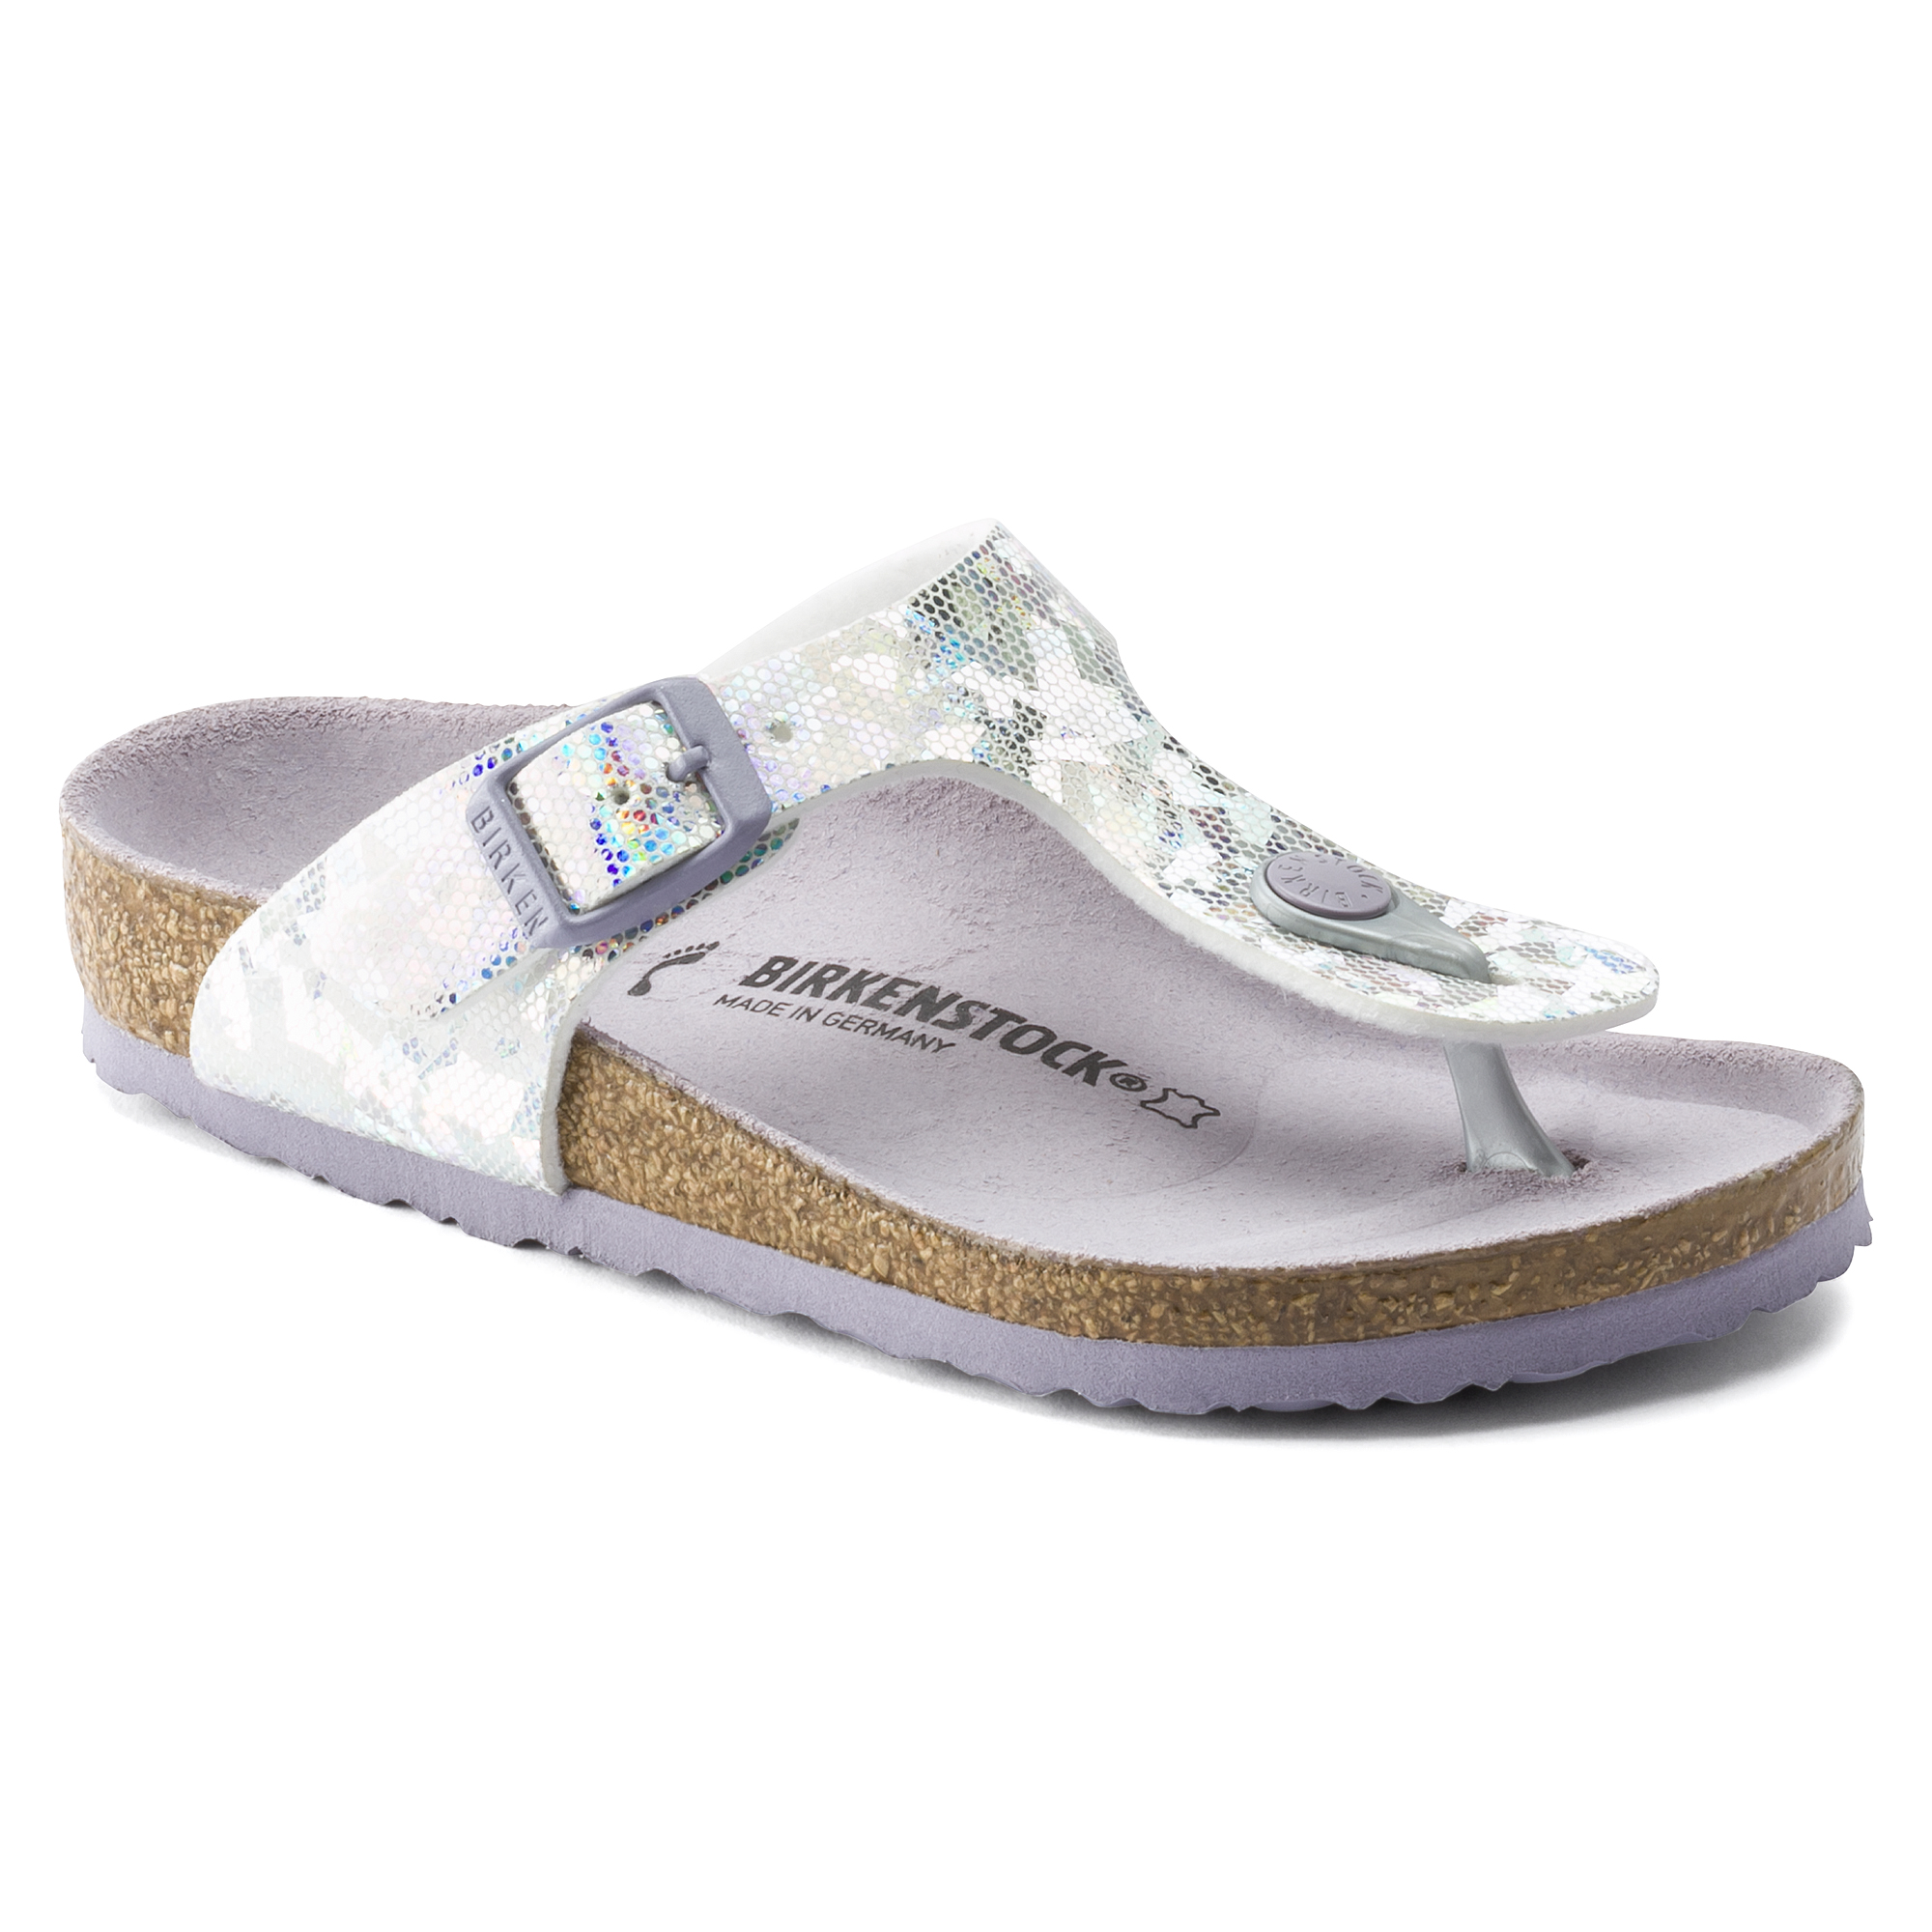 Birkenstock Gizeh Kids Hologram Silver